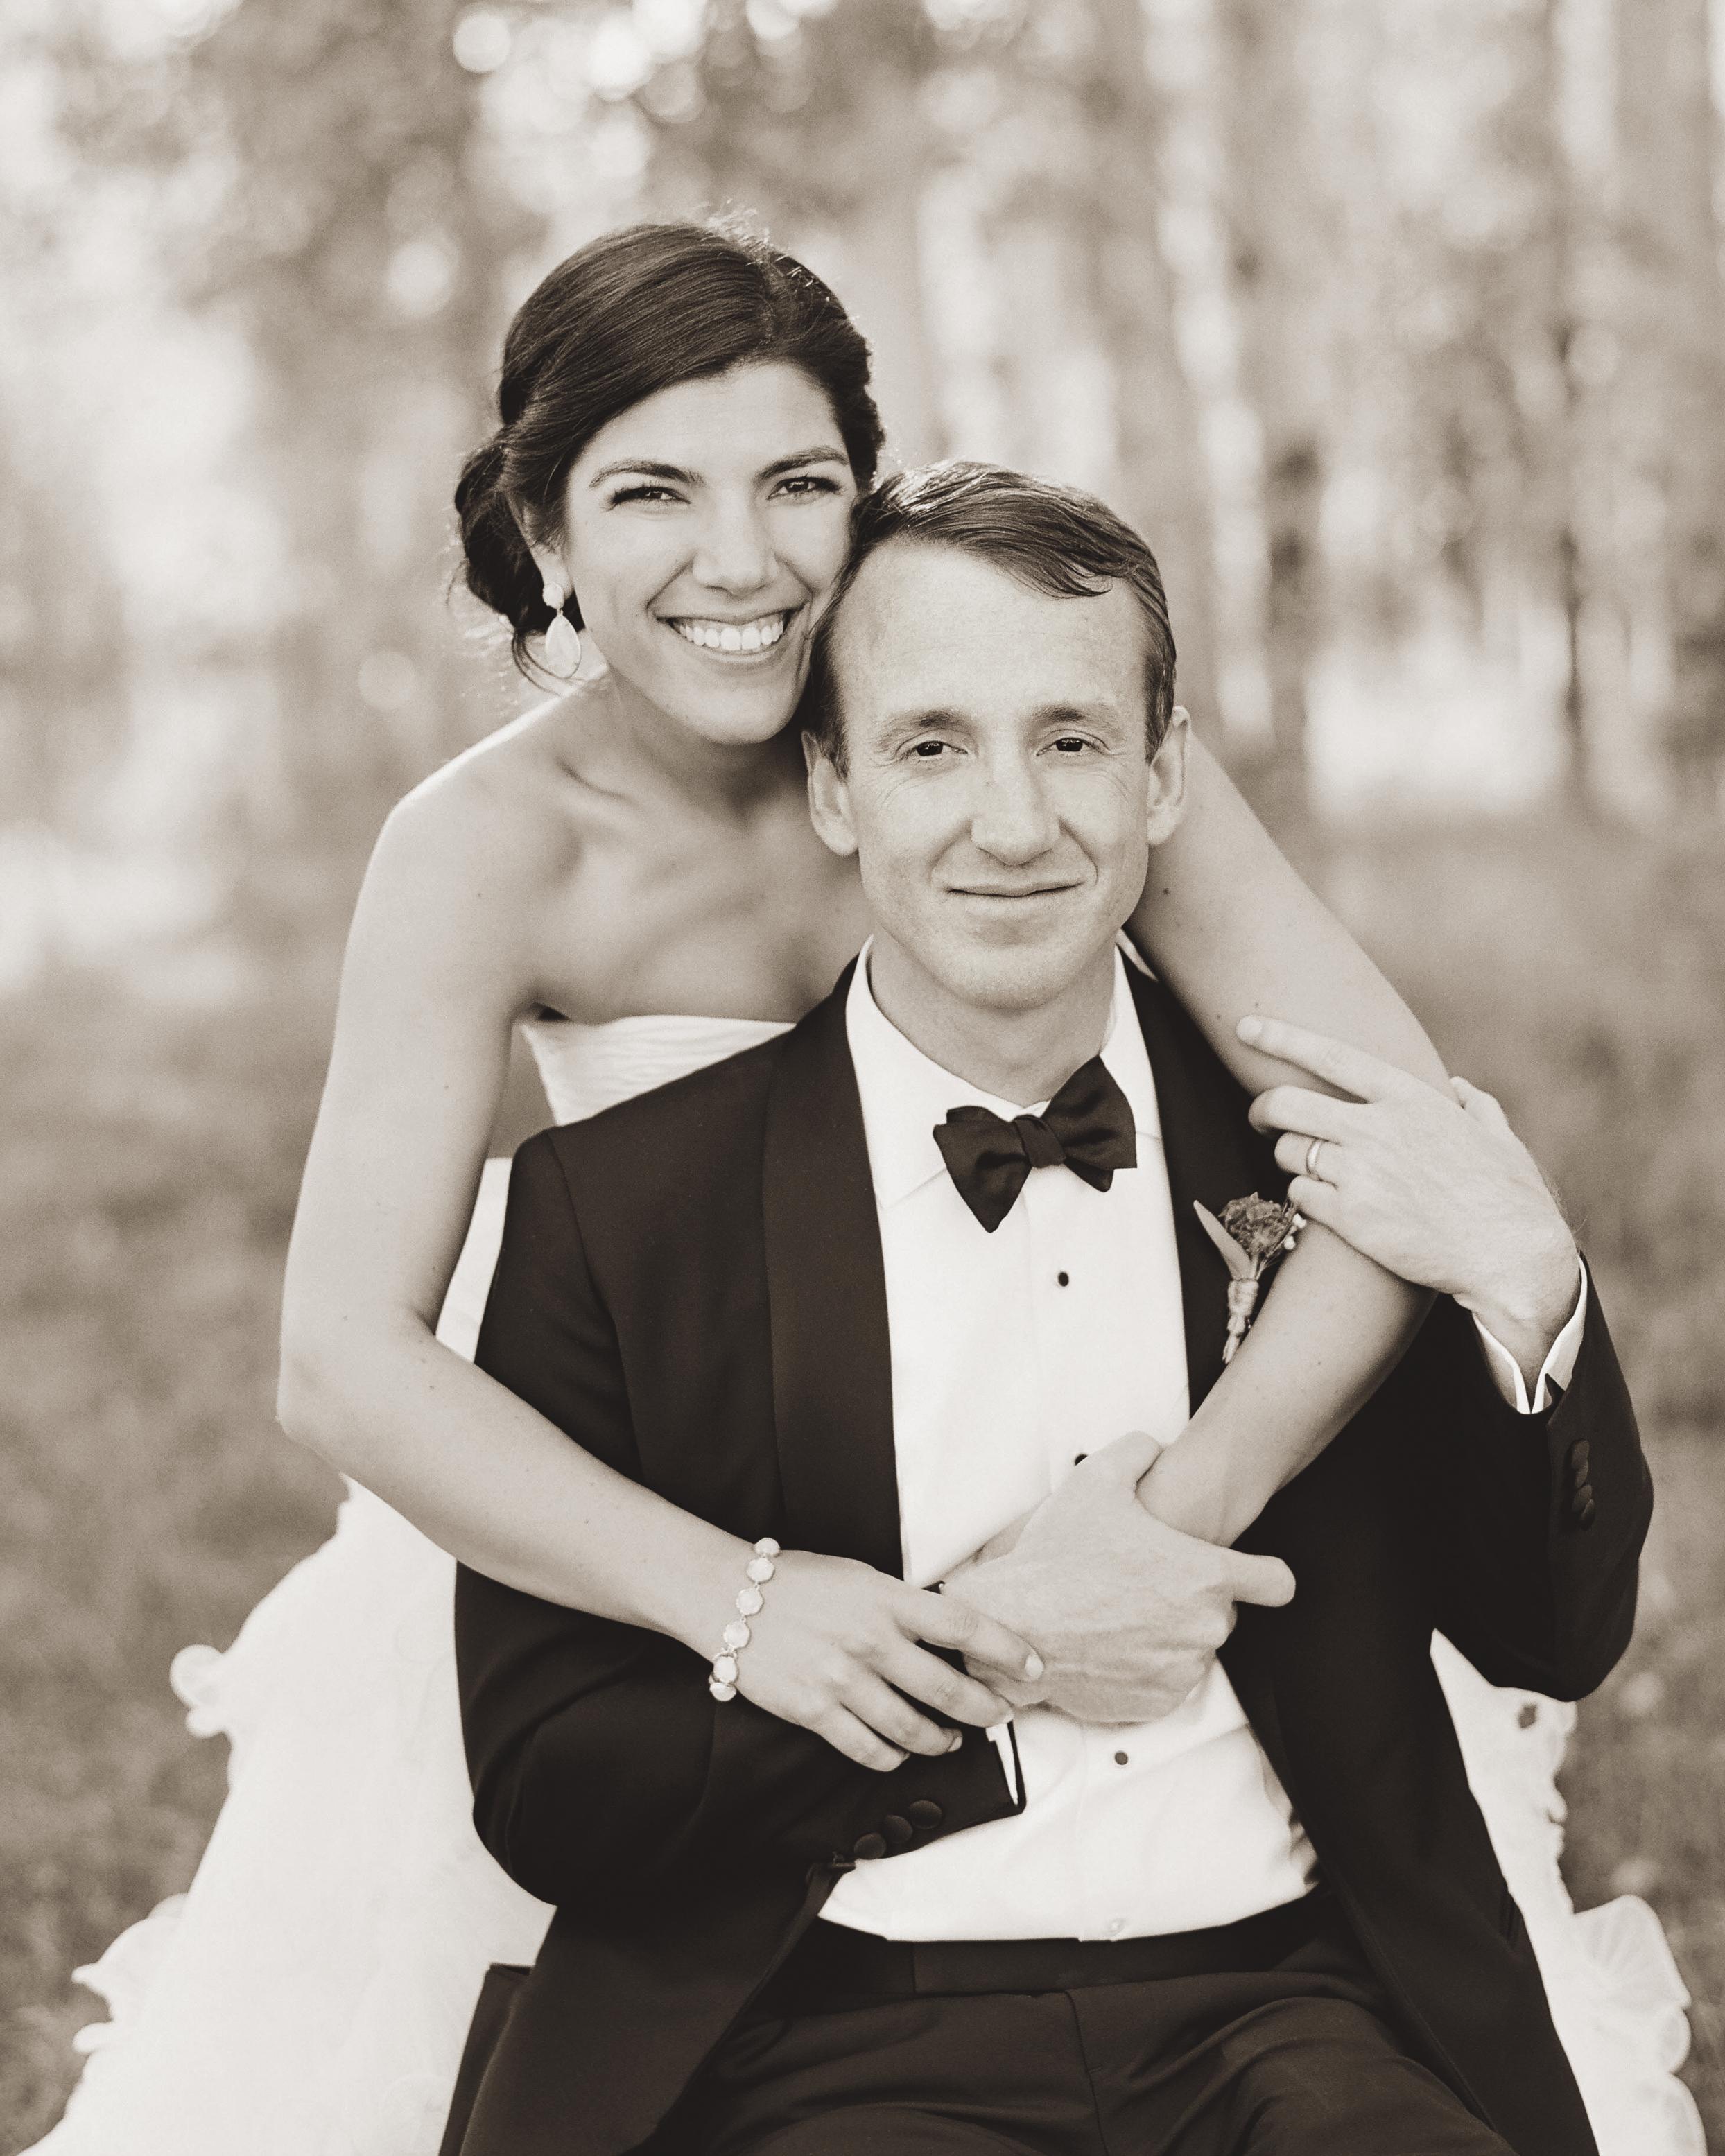 ali-andrew-wedding-wyoming-323-s111942-bw.jpg